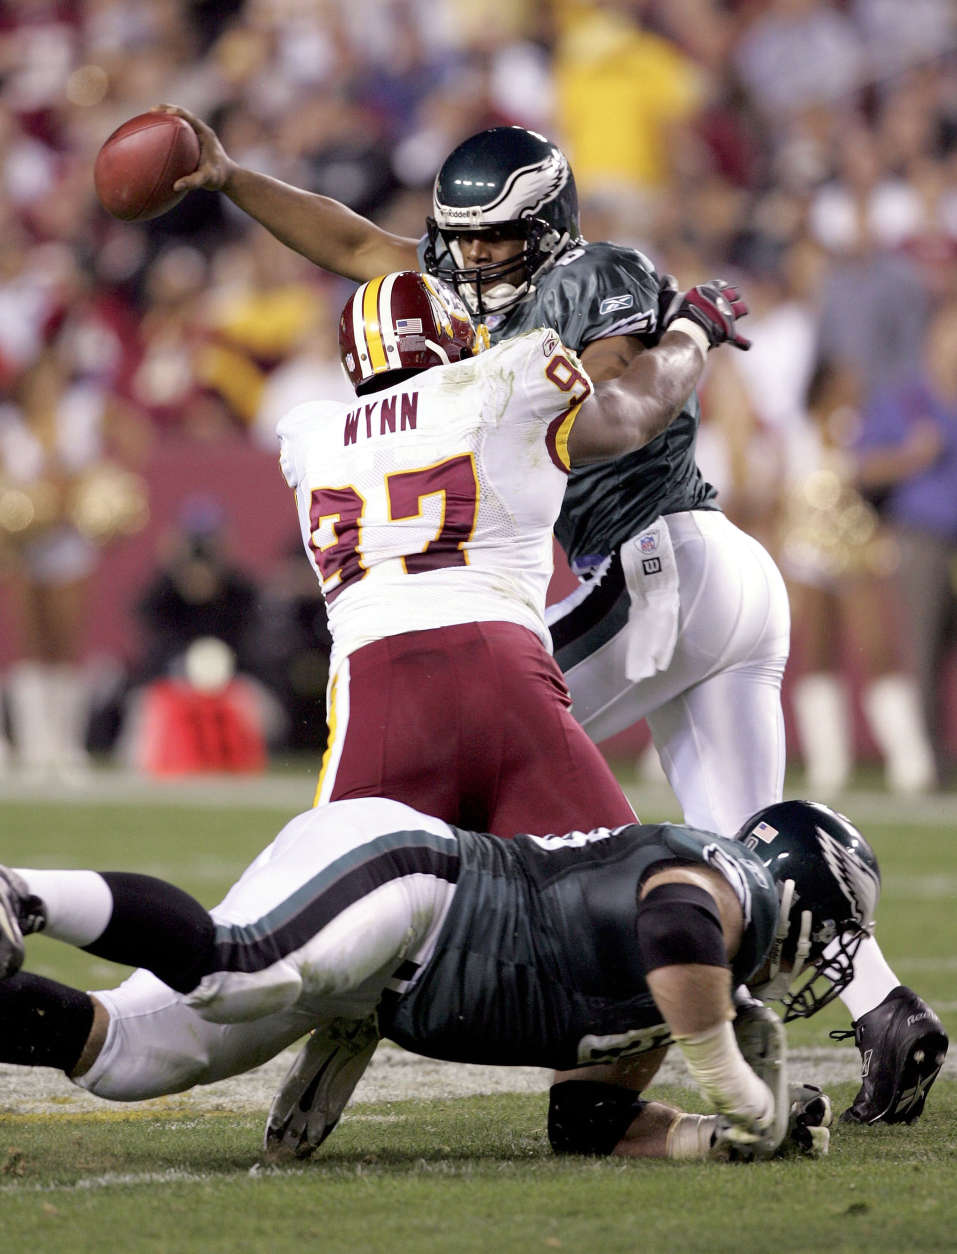 LANDOVER, MD - NOVEMBER 6:  Quarterback Donovan McNabb #5 of the Philadelphia Eagles scrambles under pressure from defensive end Renaldo Wynn #97 of the Washington Redskins on November 6, 2005 at FedEx Field in Landover, Maryland.  (Photo by Jim McIsaac/Getty Images)